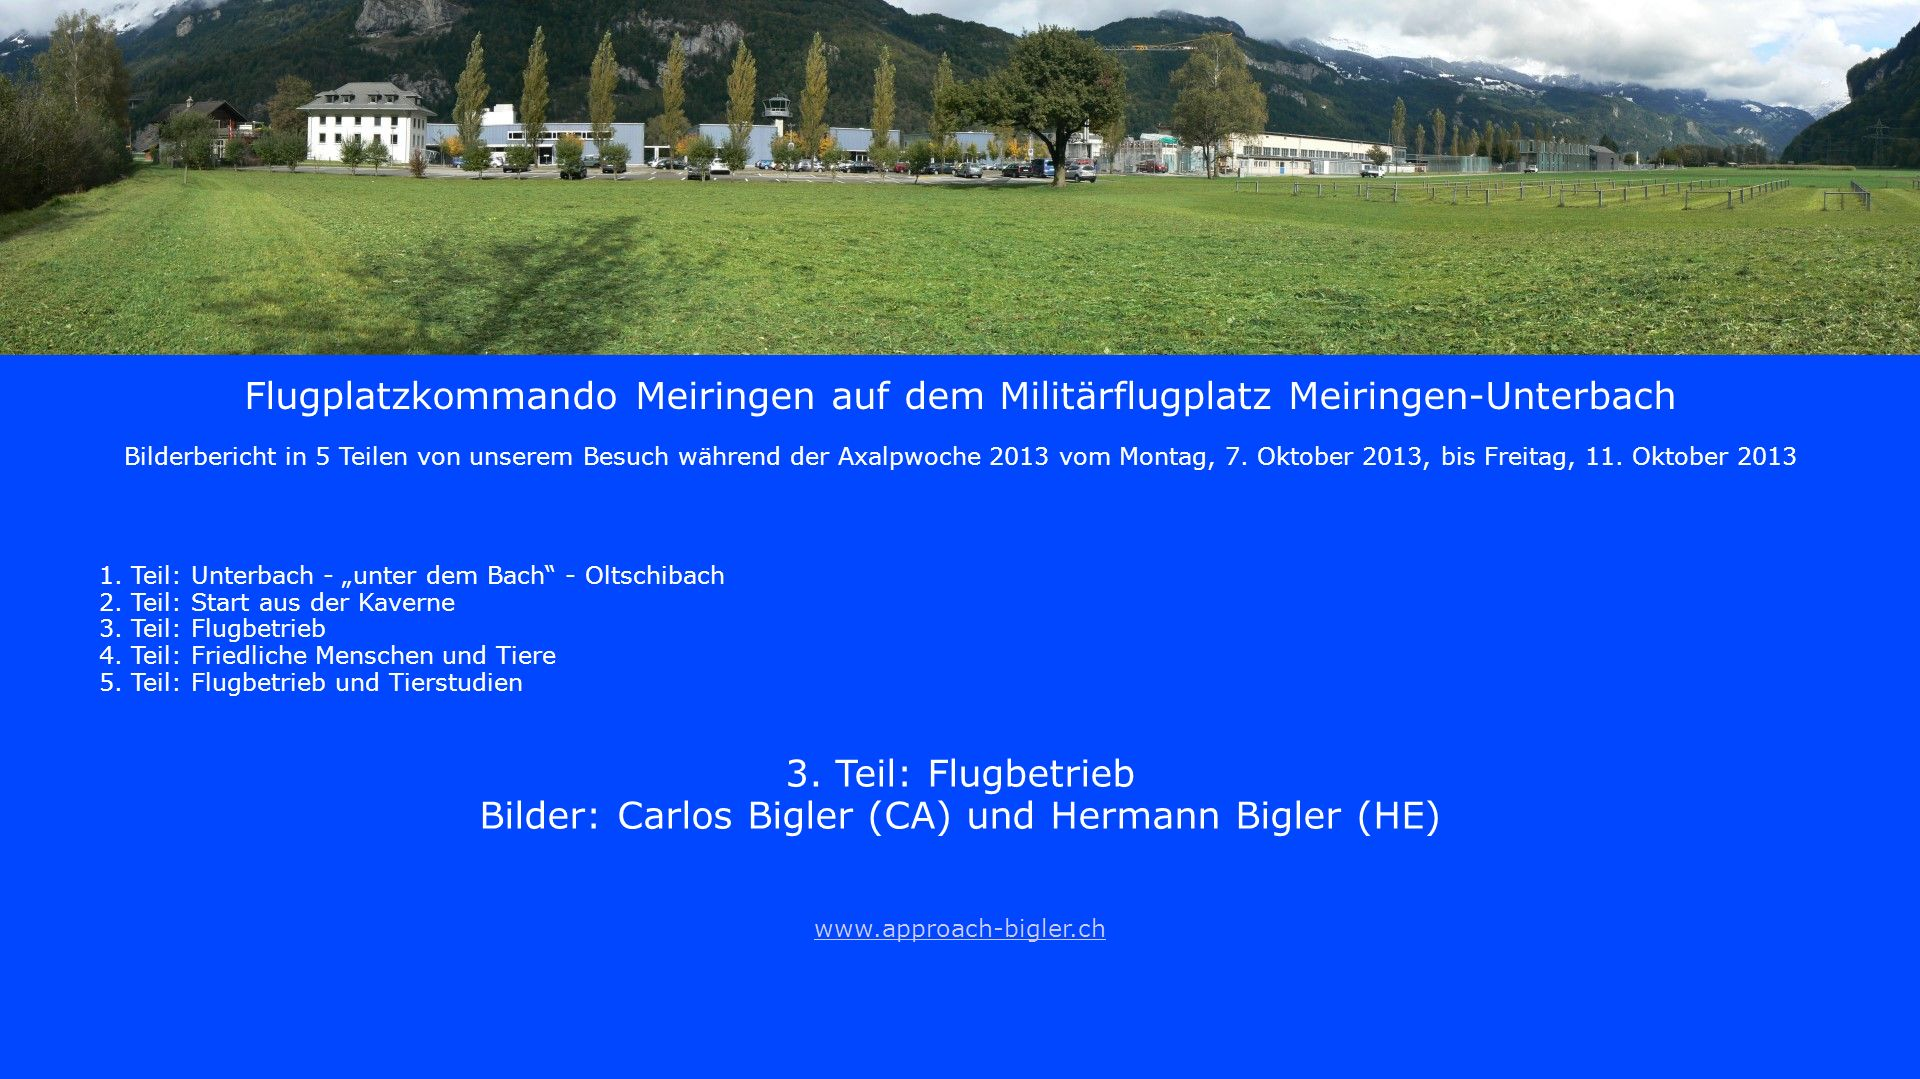 Bilder: Carlos Bigler (CA) und Hermann Bigler (HE)